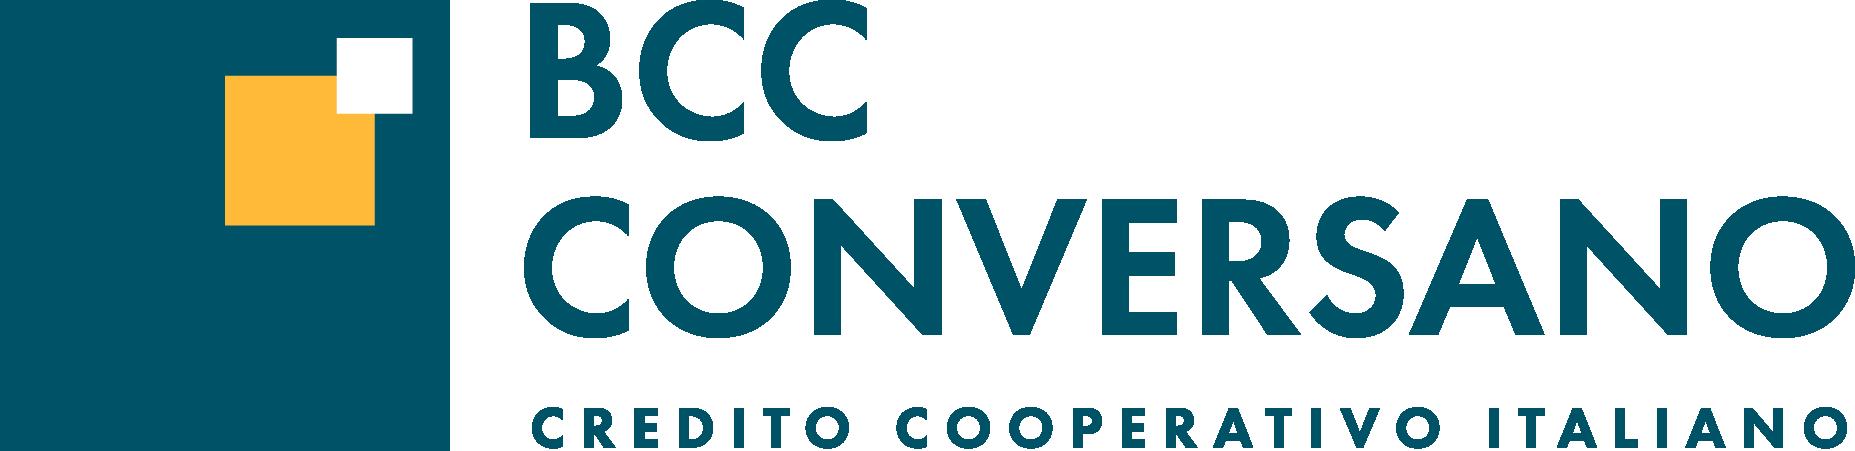 BCC CONVERSANO LECTORINFABULA